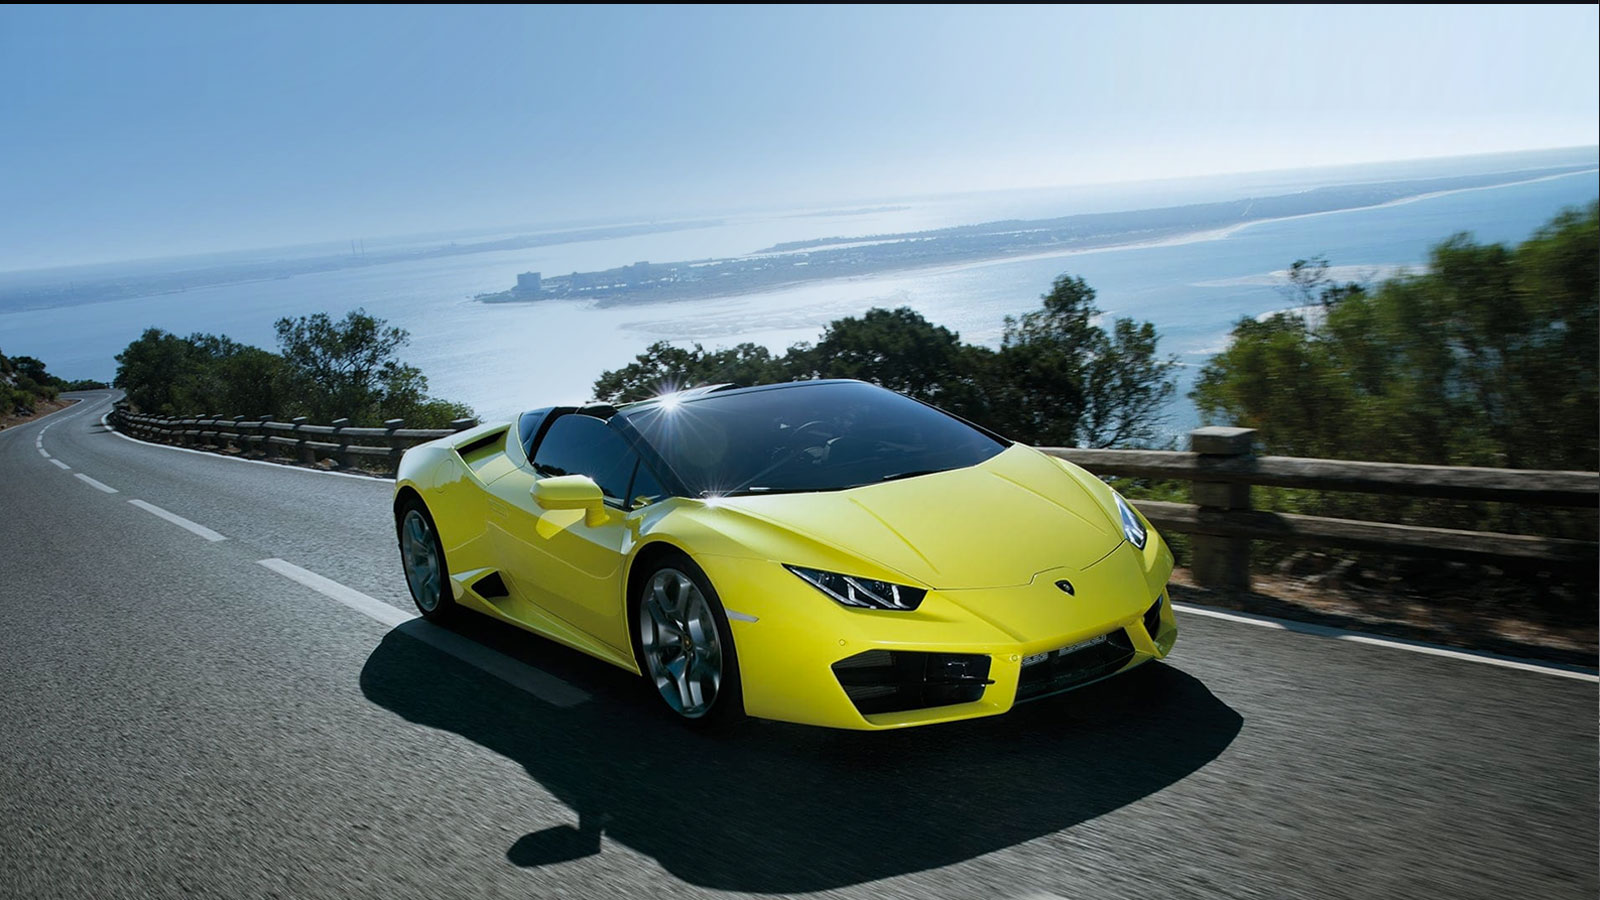 Lamborghini Huracan RWD Spyder - Breathtaking Technology image 2